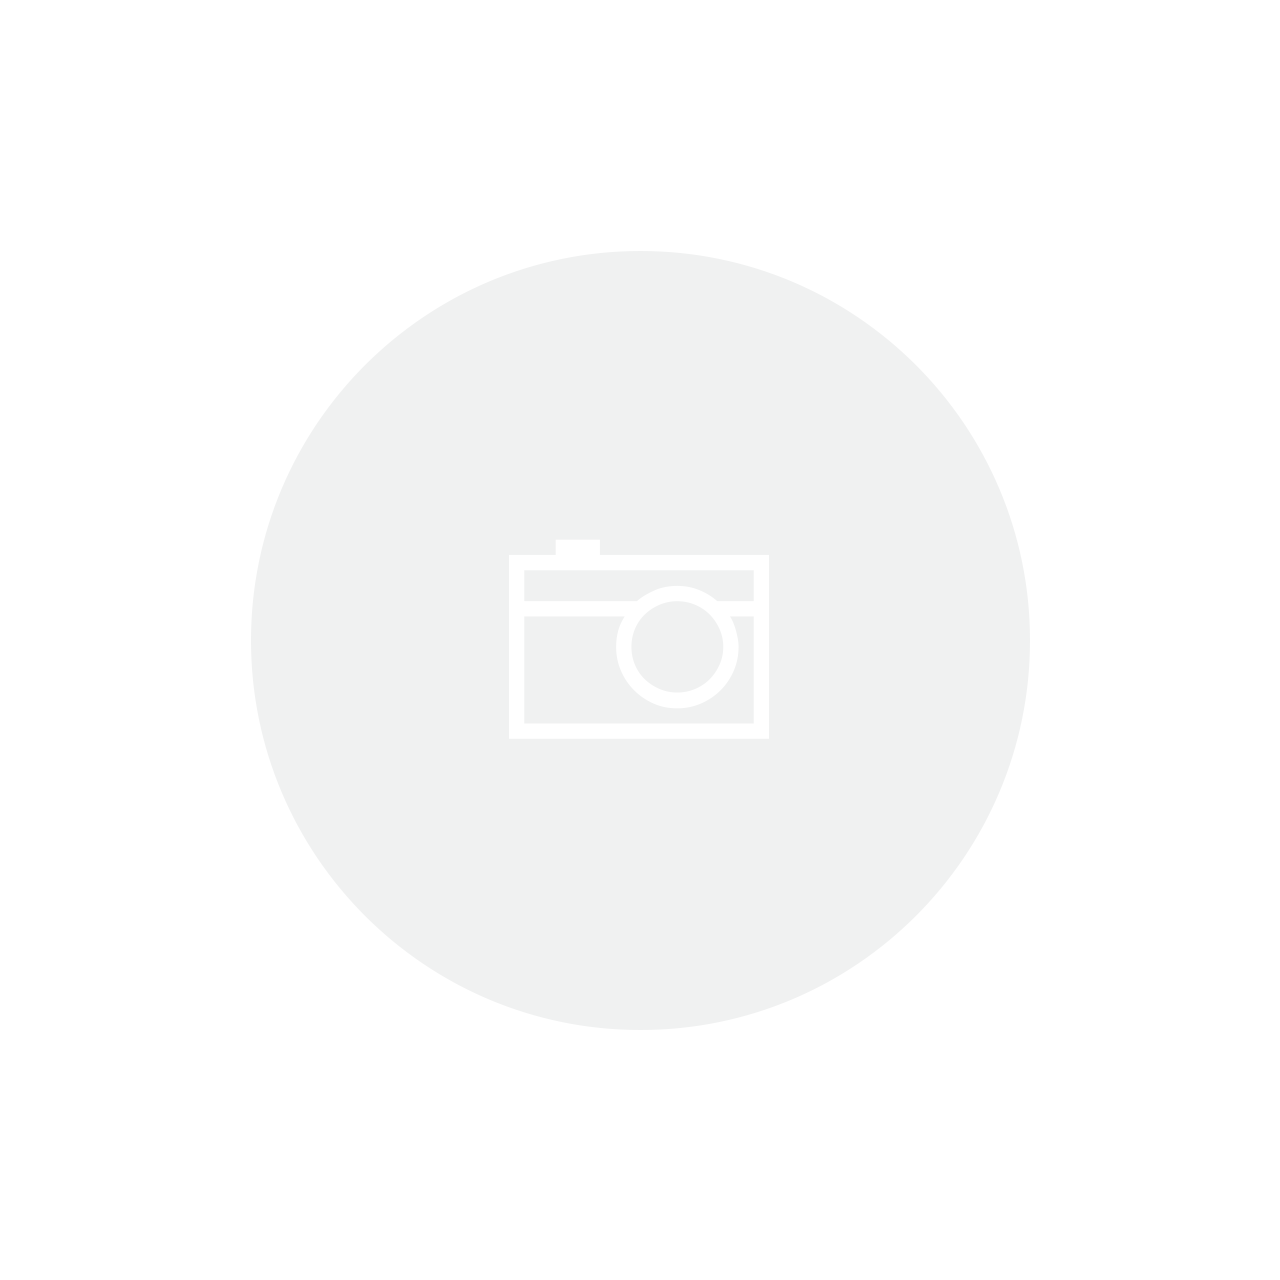 Papel Artesanal Indiano - Ref. 55